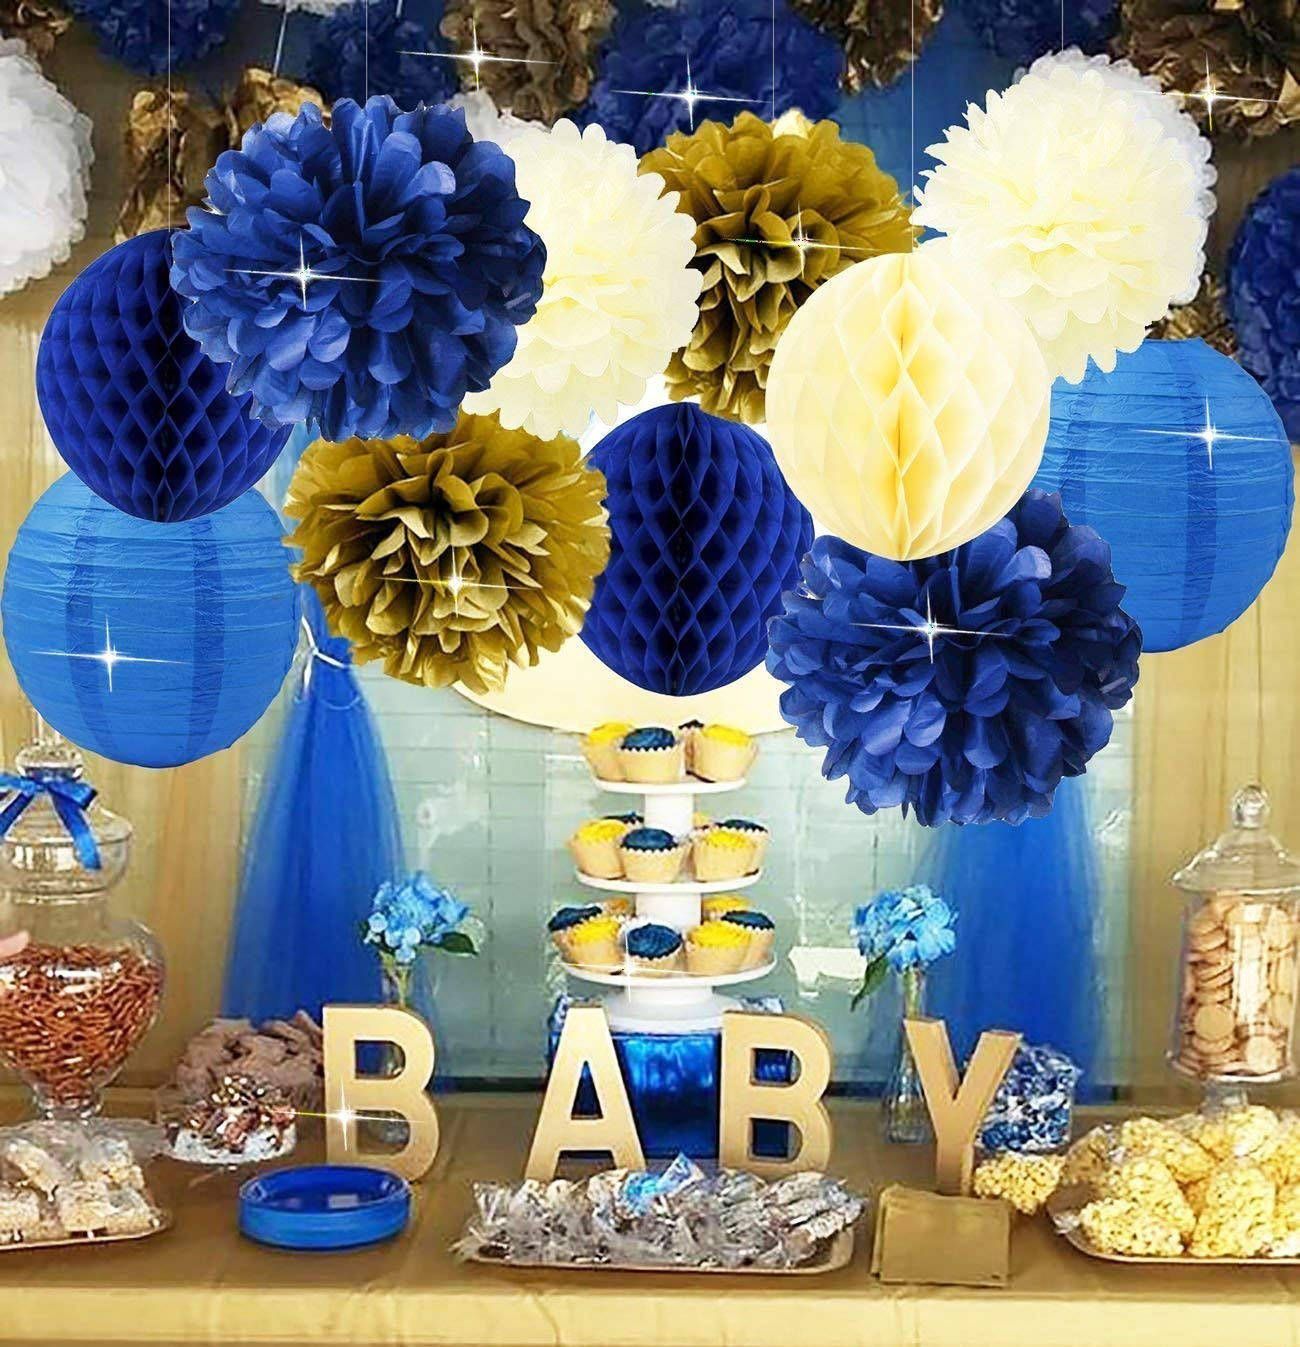 Furuix Royal Prince Baby Shower Decorations Navy Cream Gold Bridal Shower Decorations Tissue Pom Pom Flower Navy Honeycomb Balls for 1st Birthday Boy Prince Party Supplies Birthday Party Decorations